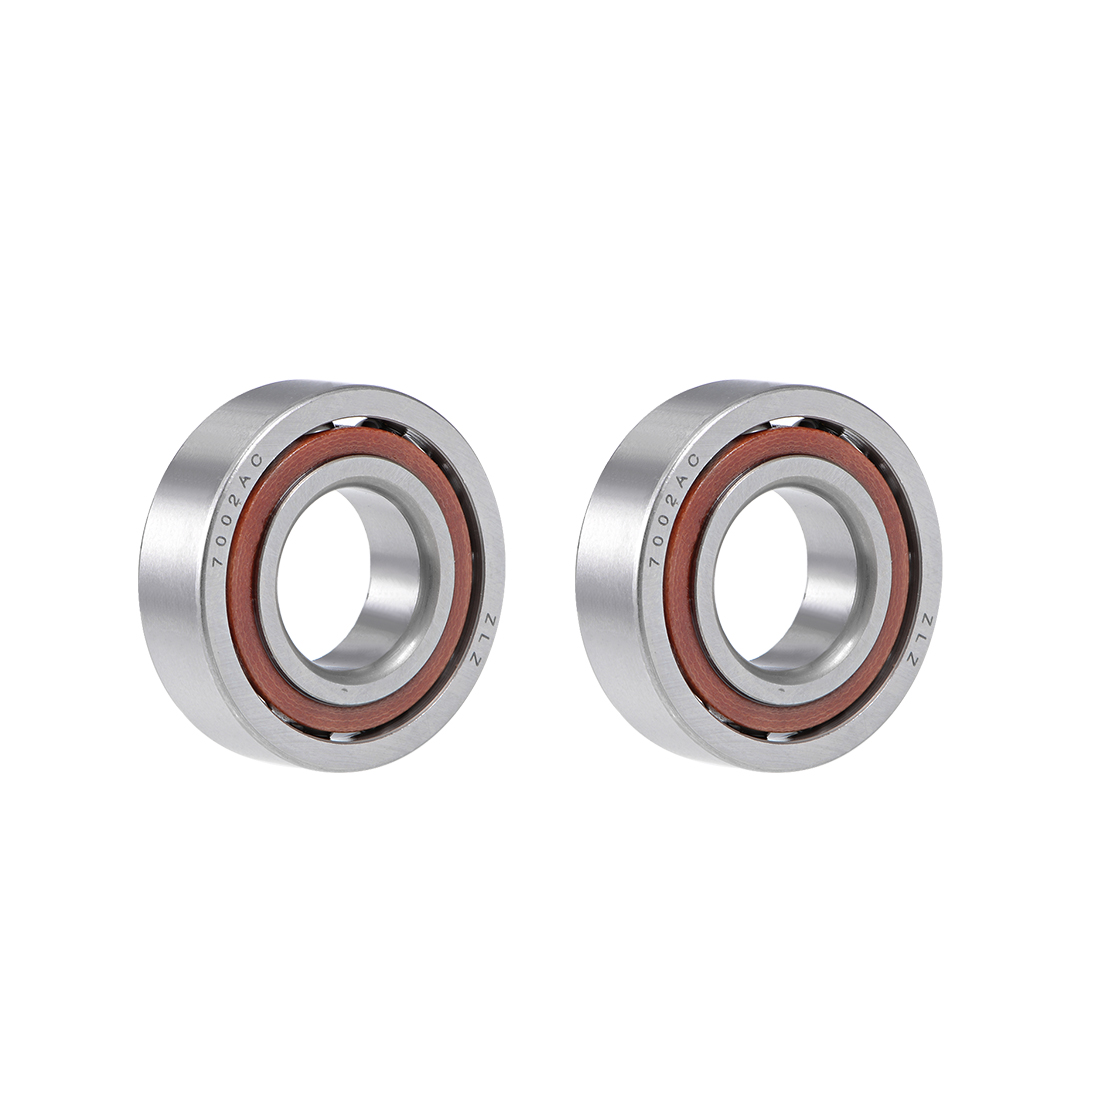 7002AC Angular Contact Ball Bearing 15x32x9mm, Single Row, Open Type 2pcs